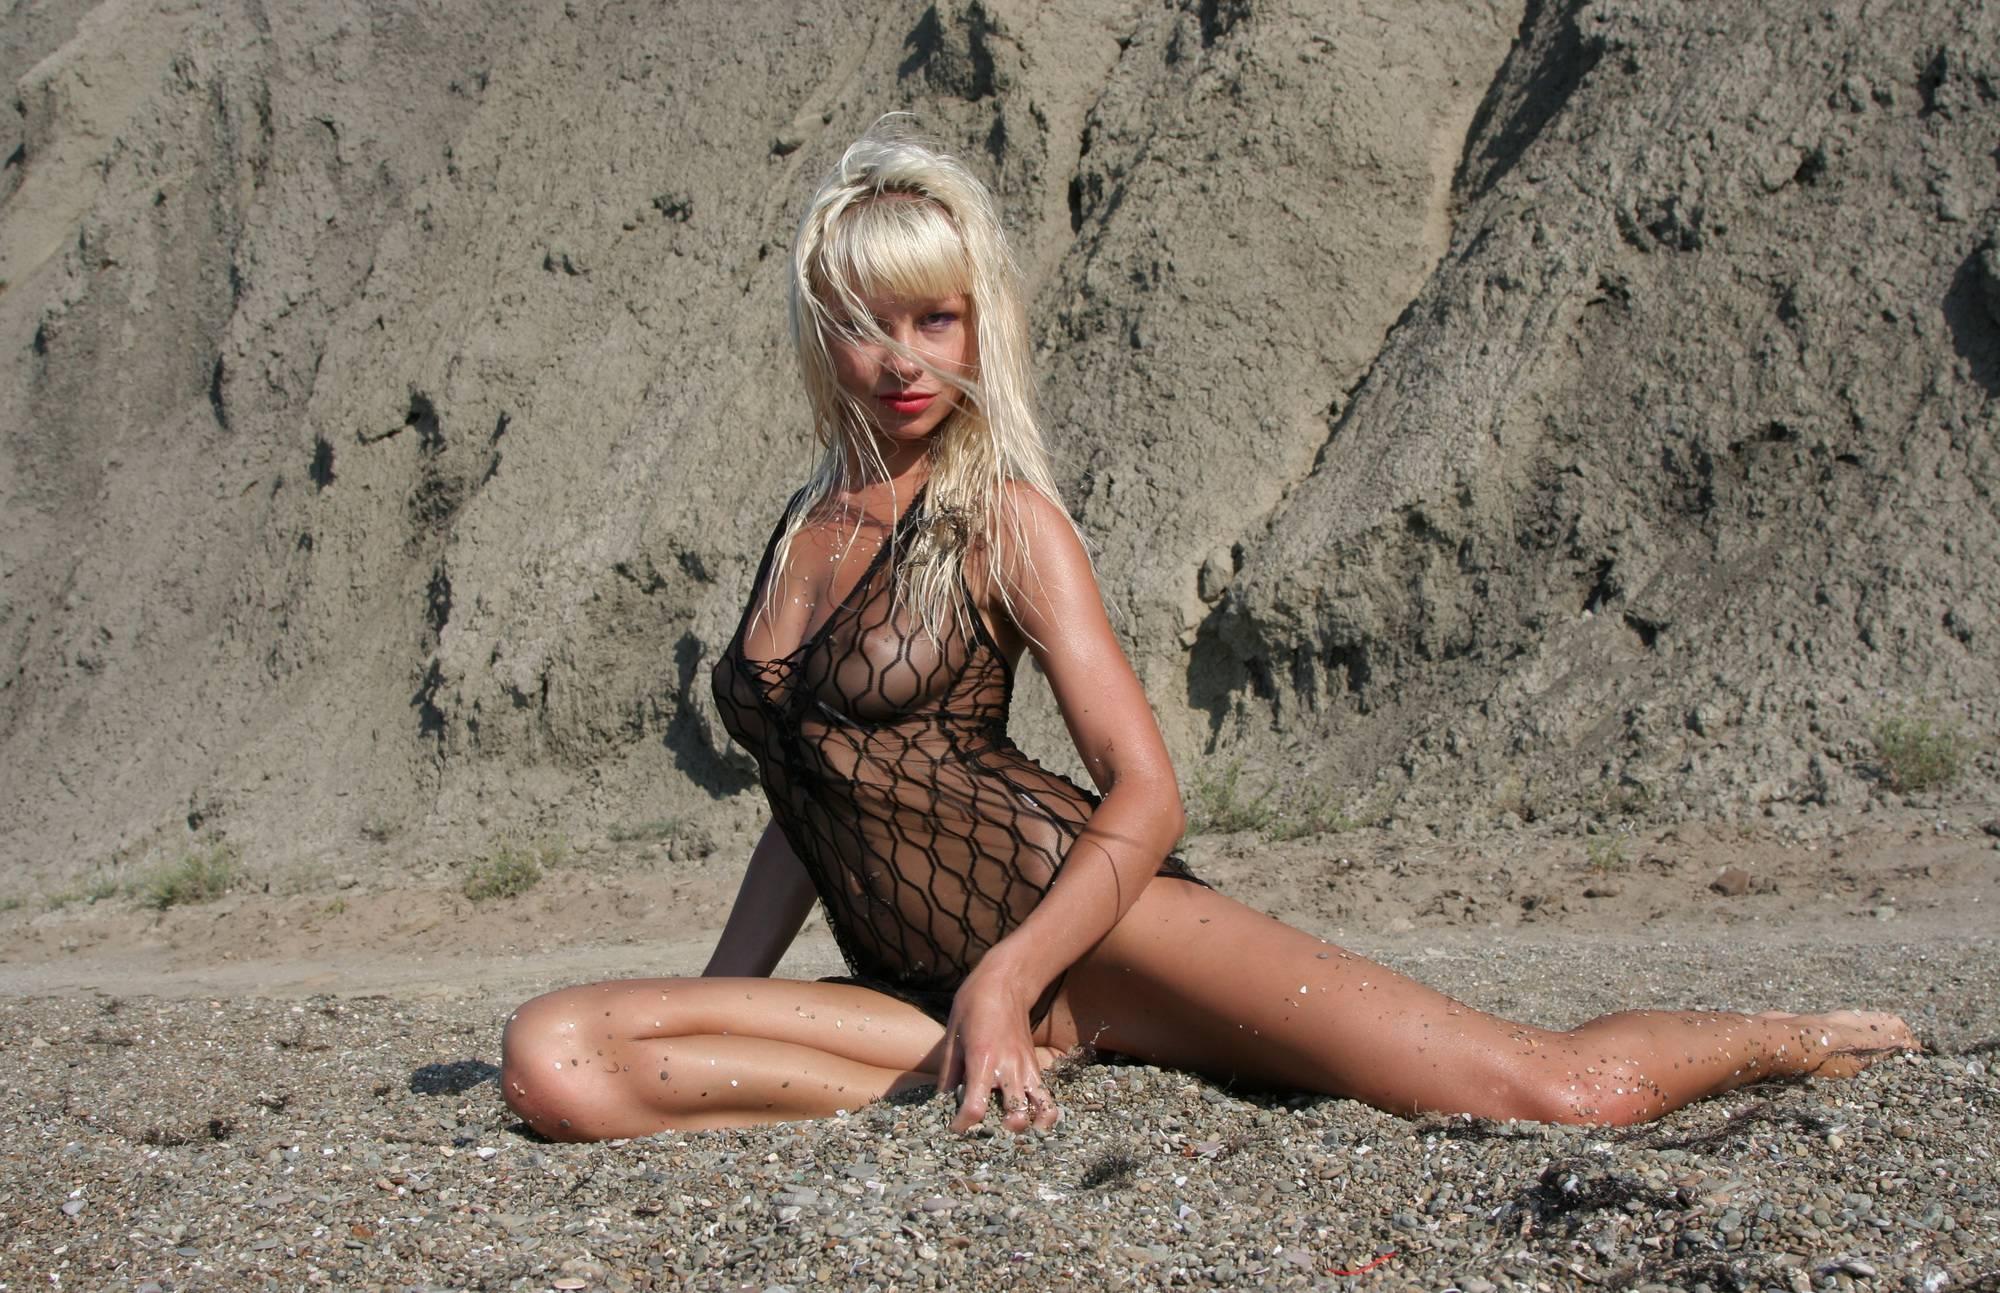 Blonde Nude on the Beach - 2